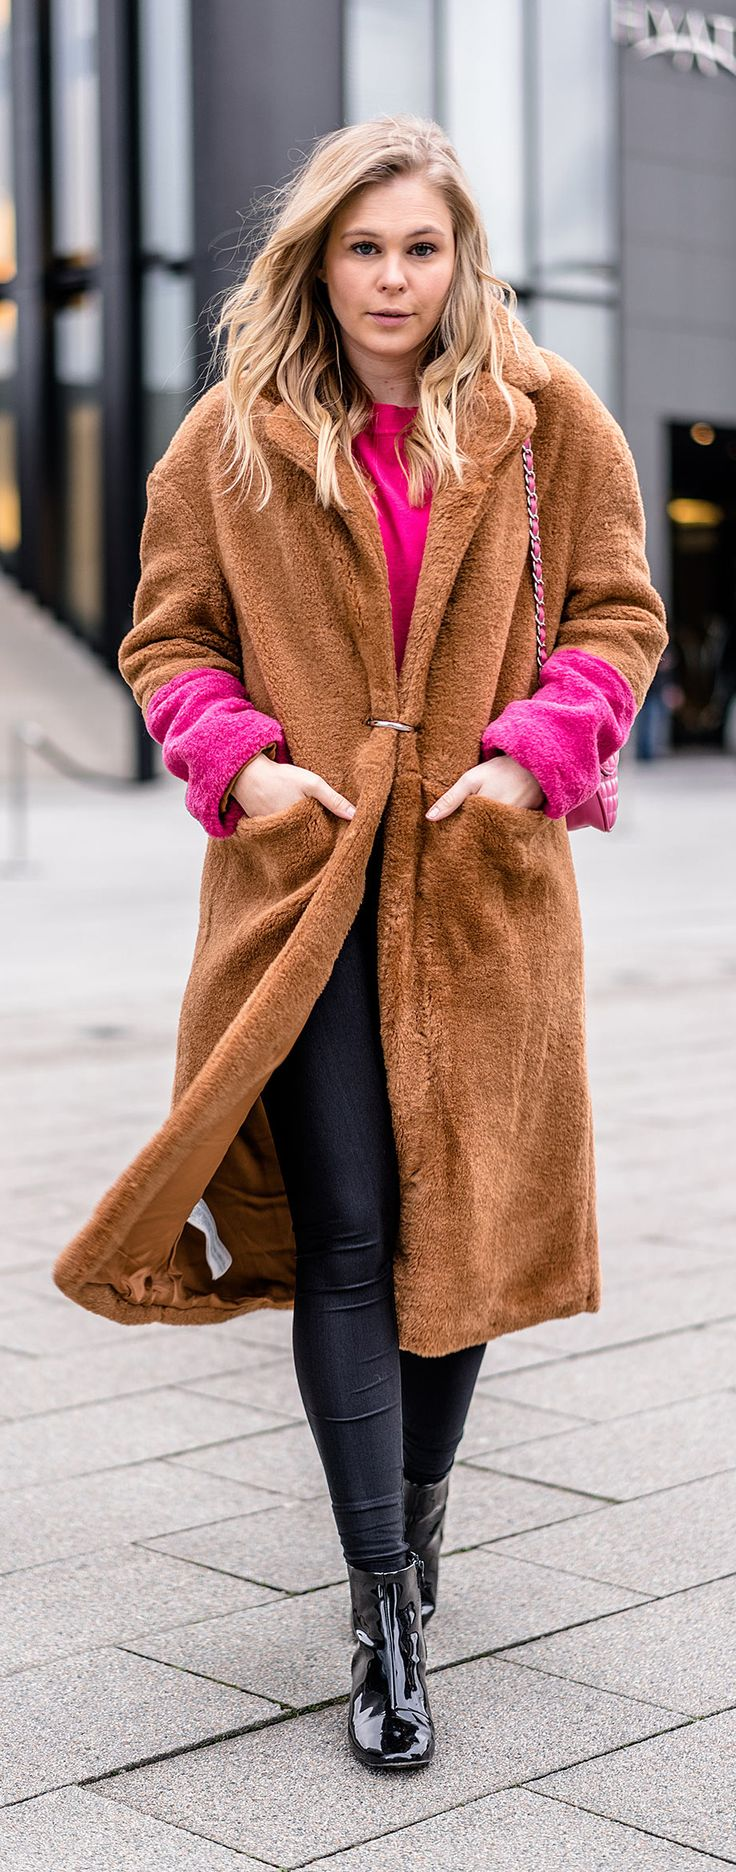 Camel Coat mit pinken Details - Camel & Pink das perfekte Color Blocking Duo // mantel, teddyfell, outfit, ootd, winter, frühling, spring, streestyle, look, fashion, frauen, women, girls, tasche, bag, blogger, blog, düsseldorf, berlin, hamburg, münchen, paris, new york, london, mailand, Blond, Blonde, Designer, Trend, It-Piece, Must-Have, Germany, Sunnyinga, 2018